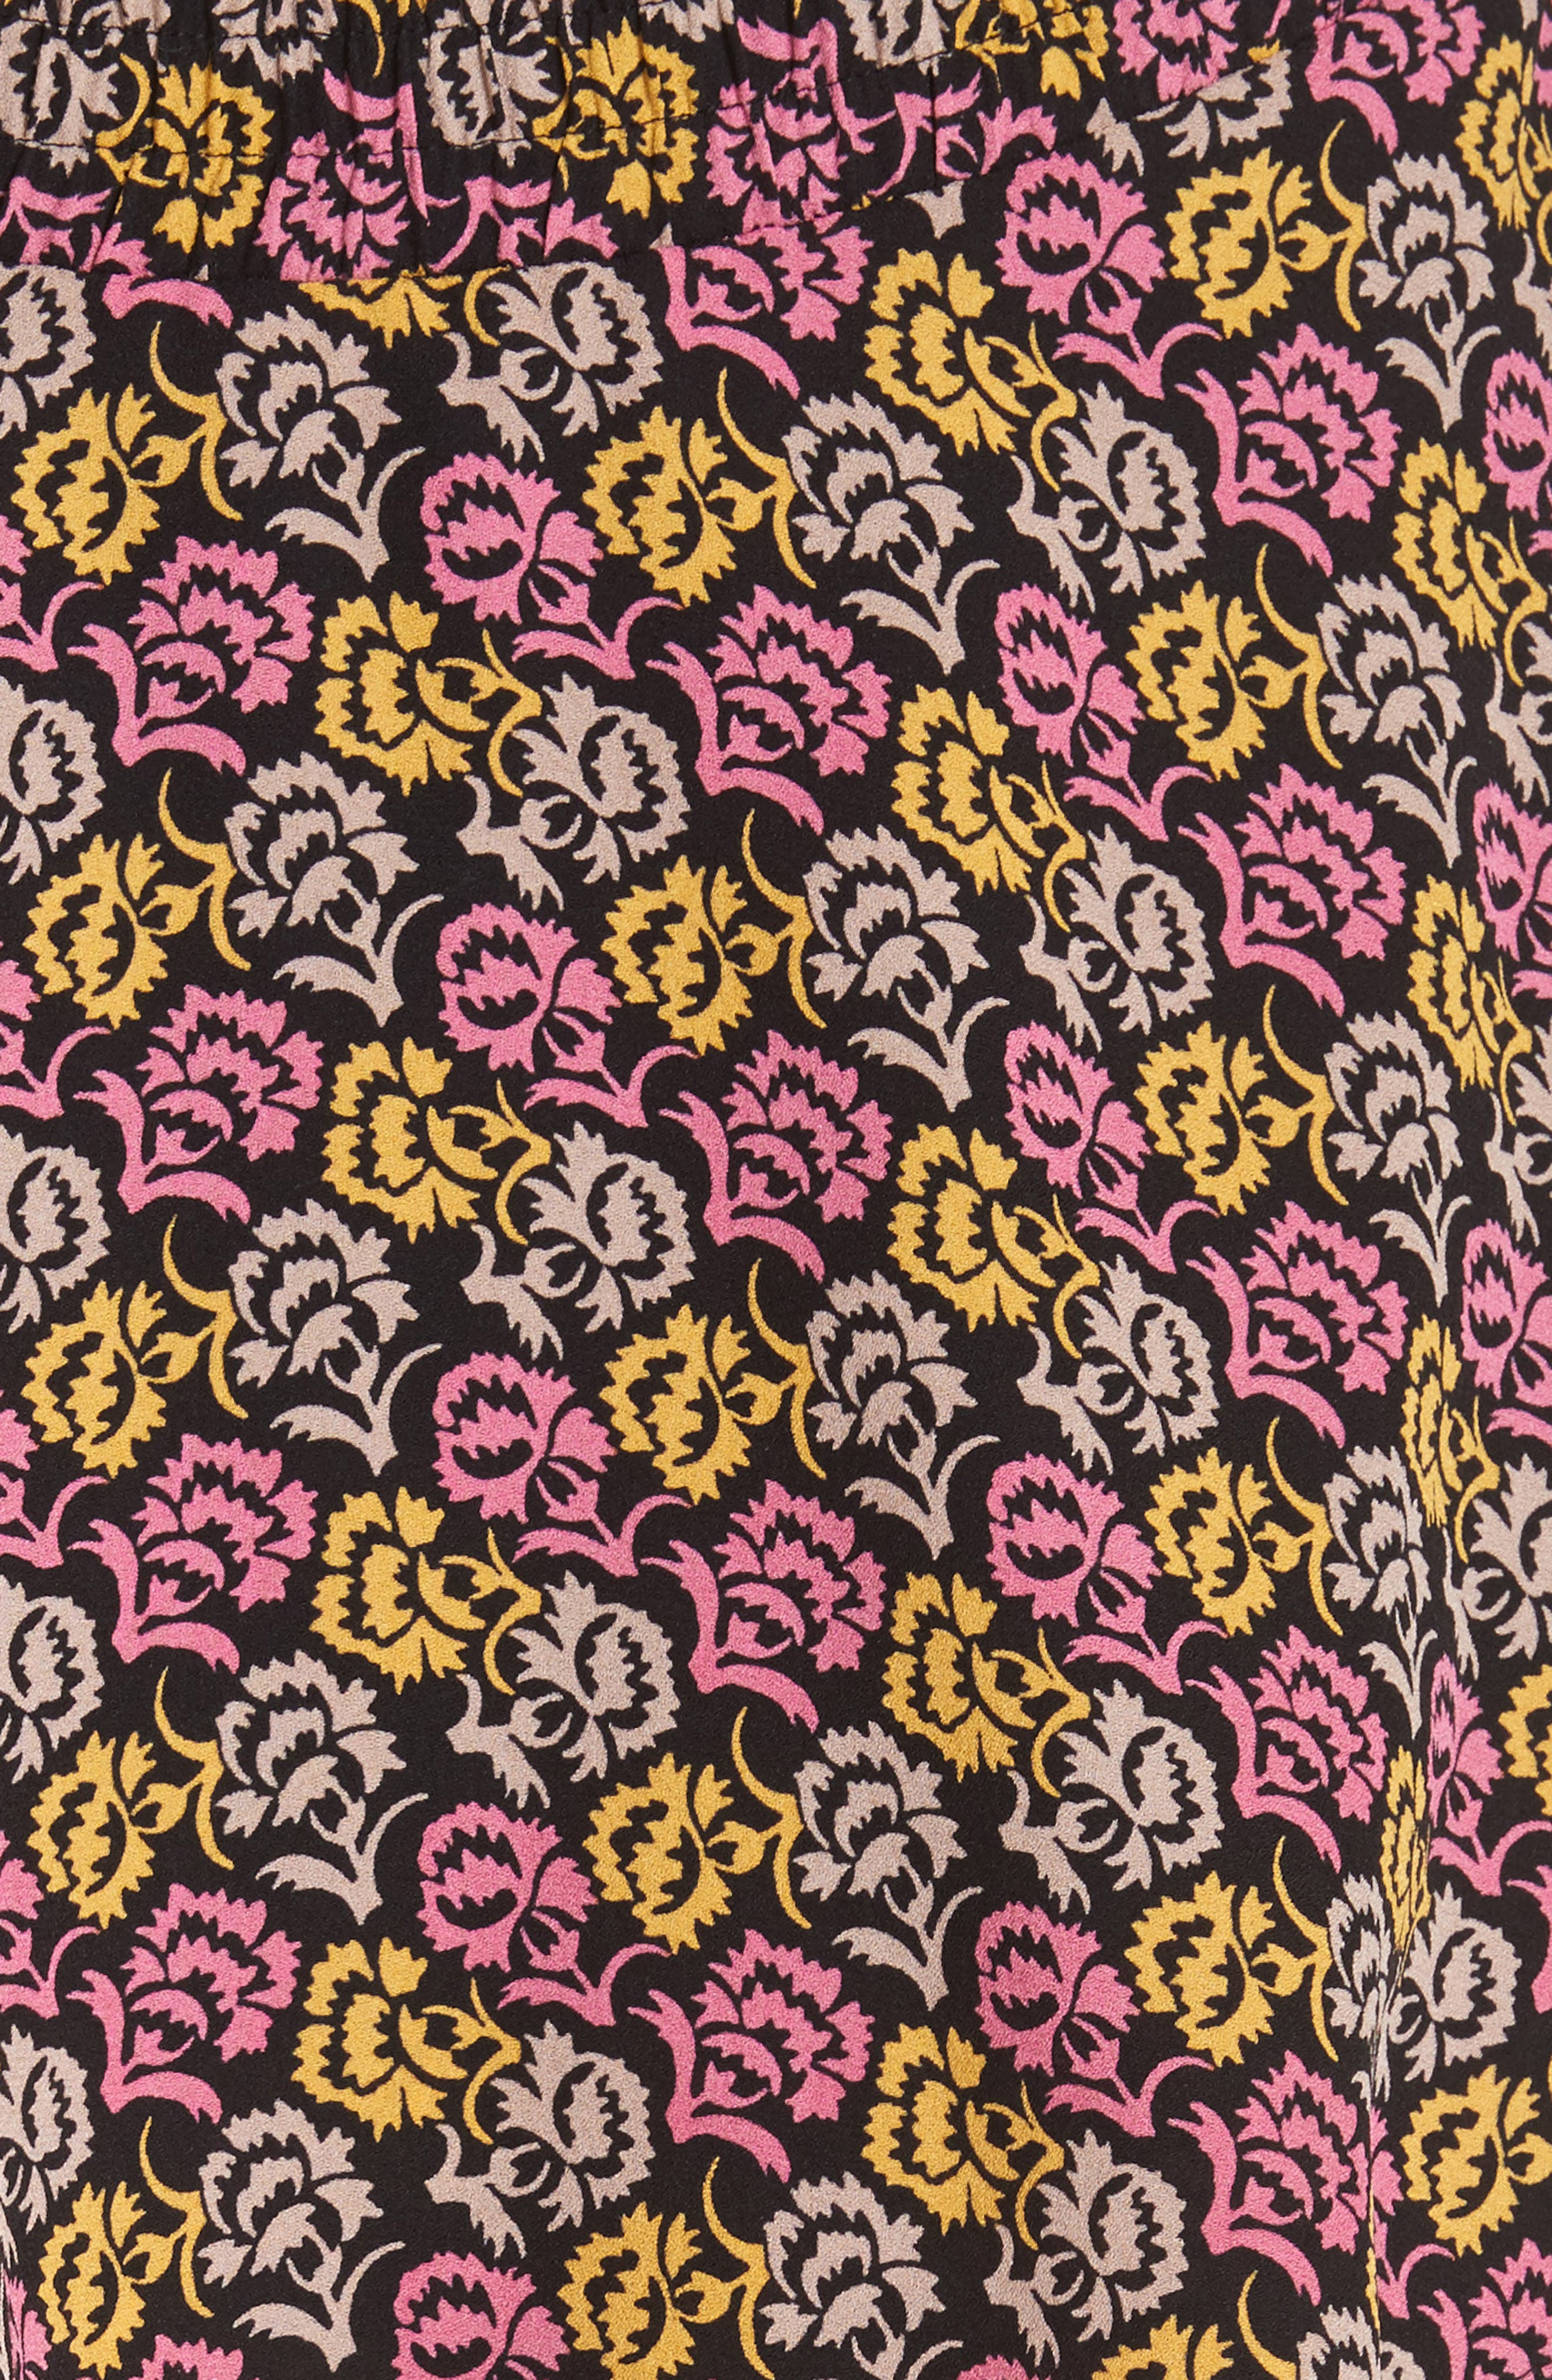 Titus Print Silk Tiered Maxi Dress,                             Alternate thumbnail 5, color,                             651